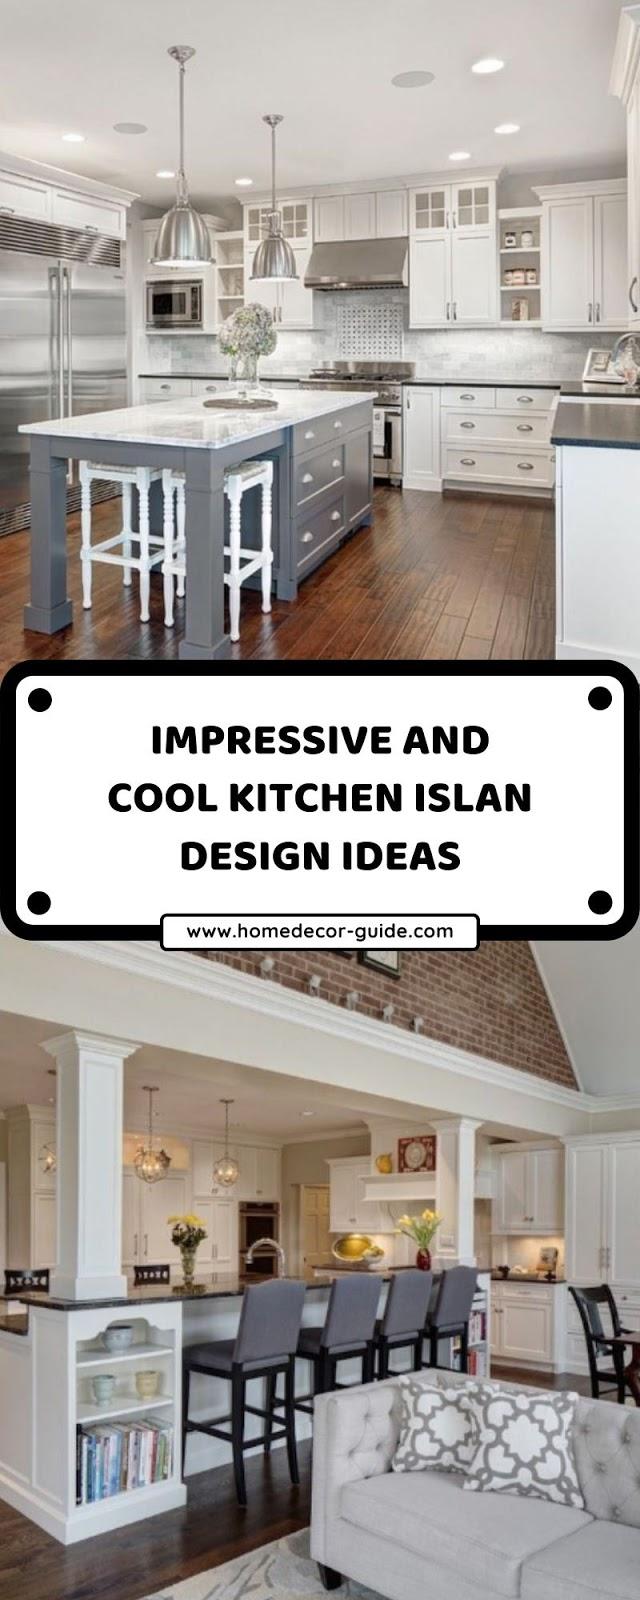 IMPRESSIVE AND COOL KITCHEN ISLAN DESIGN IDEAS